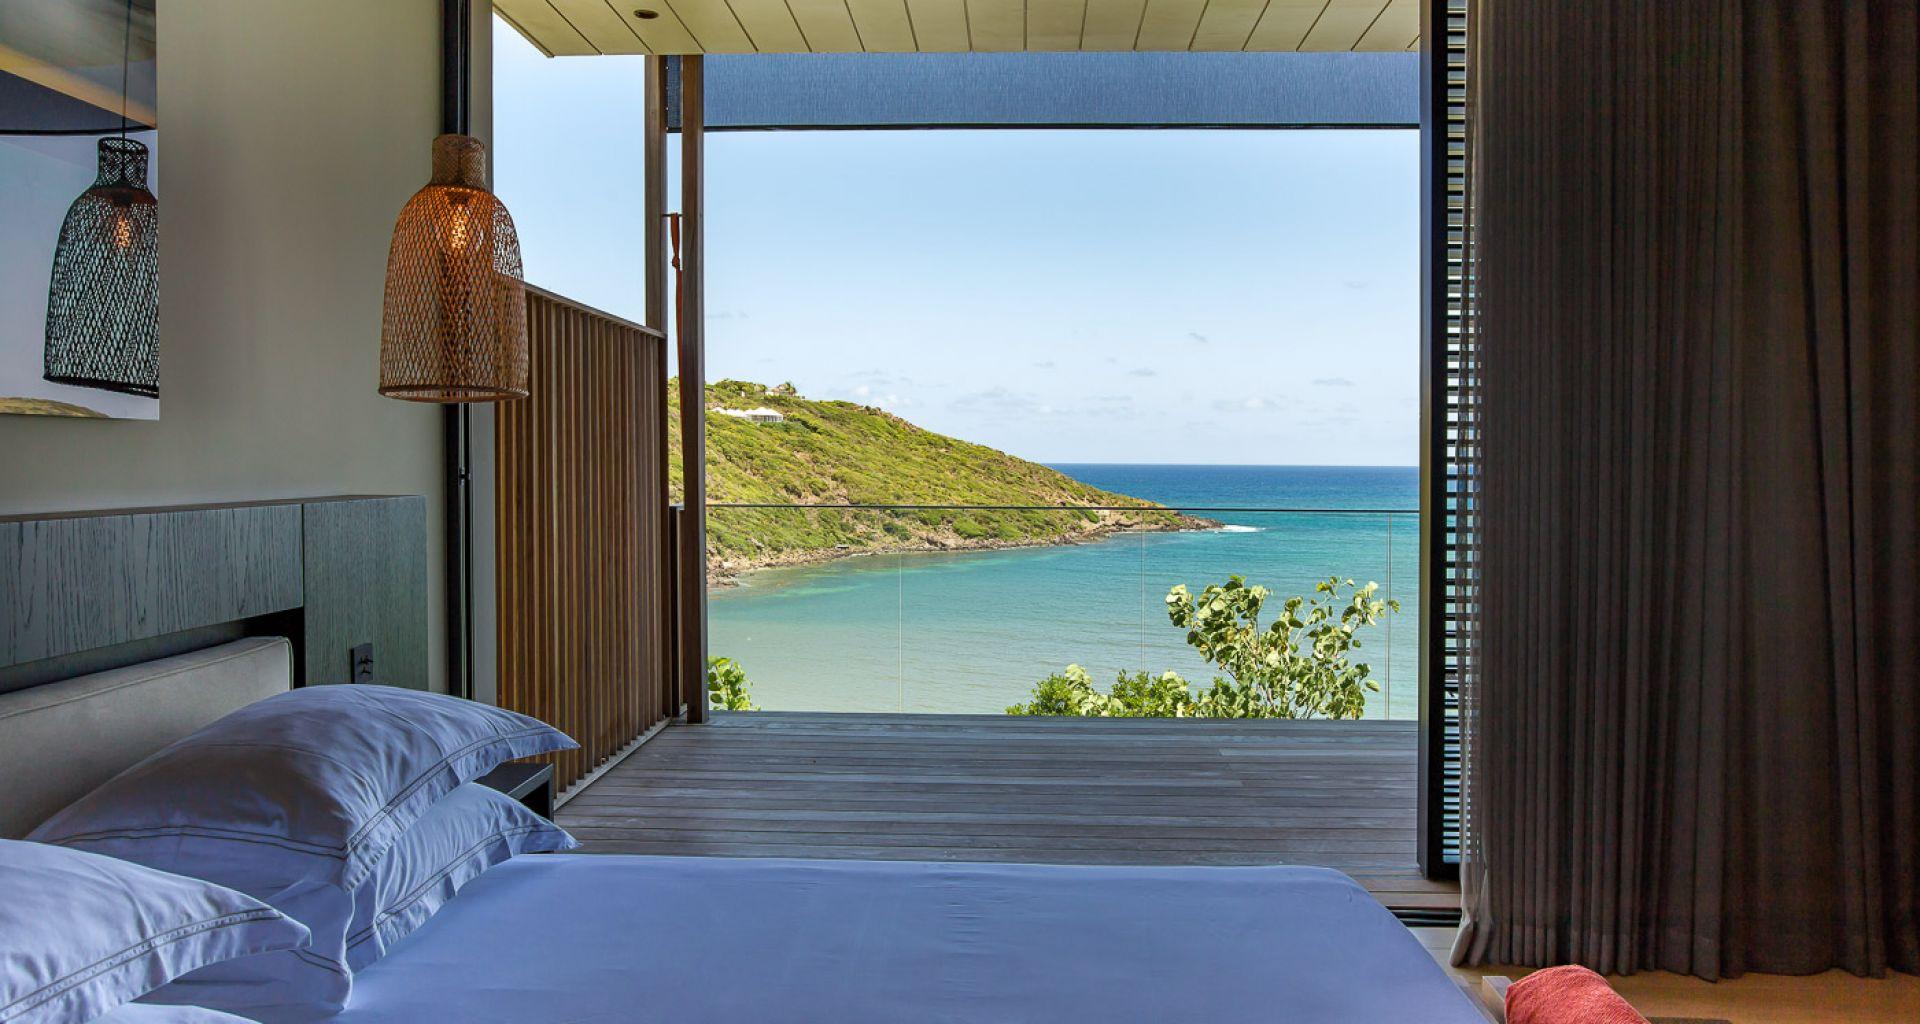 Villa Blackstone, St-Barts, Caribbean